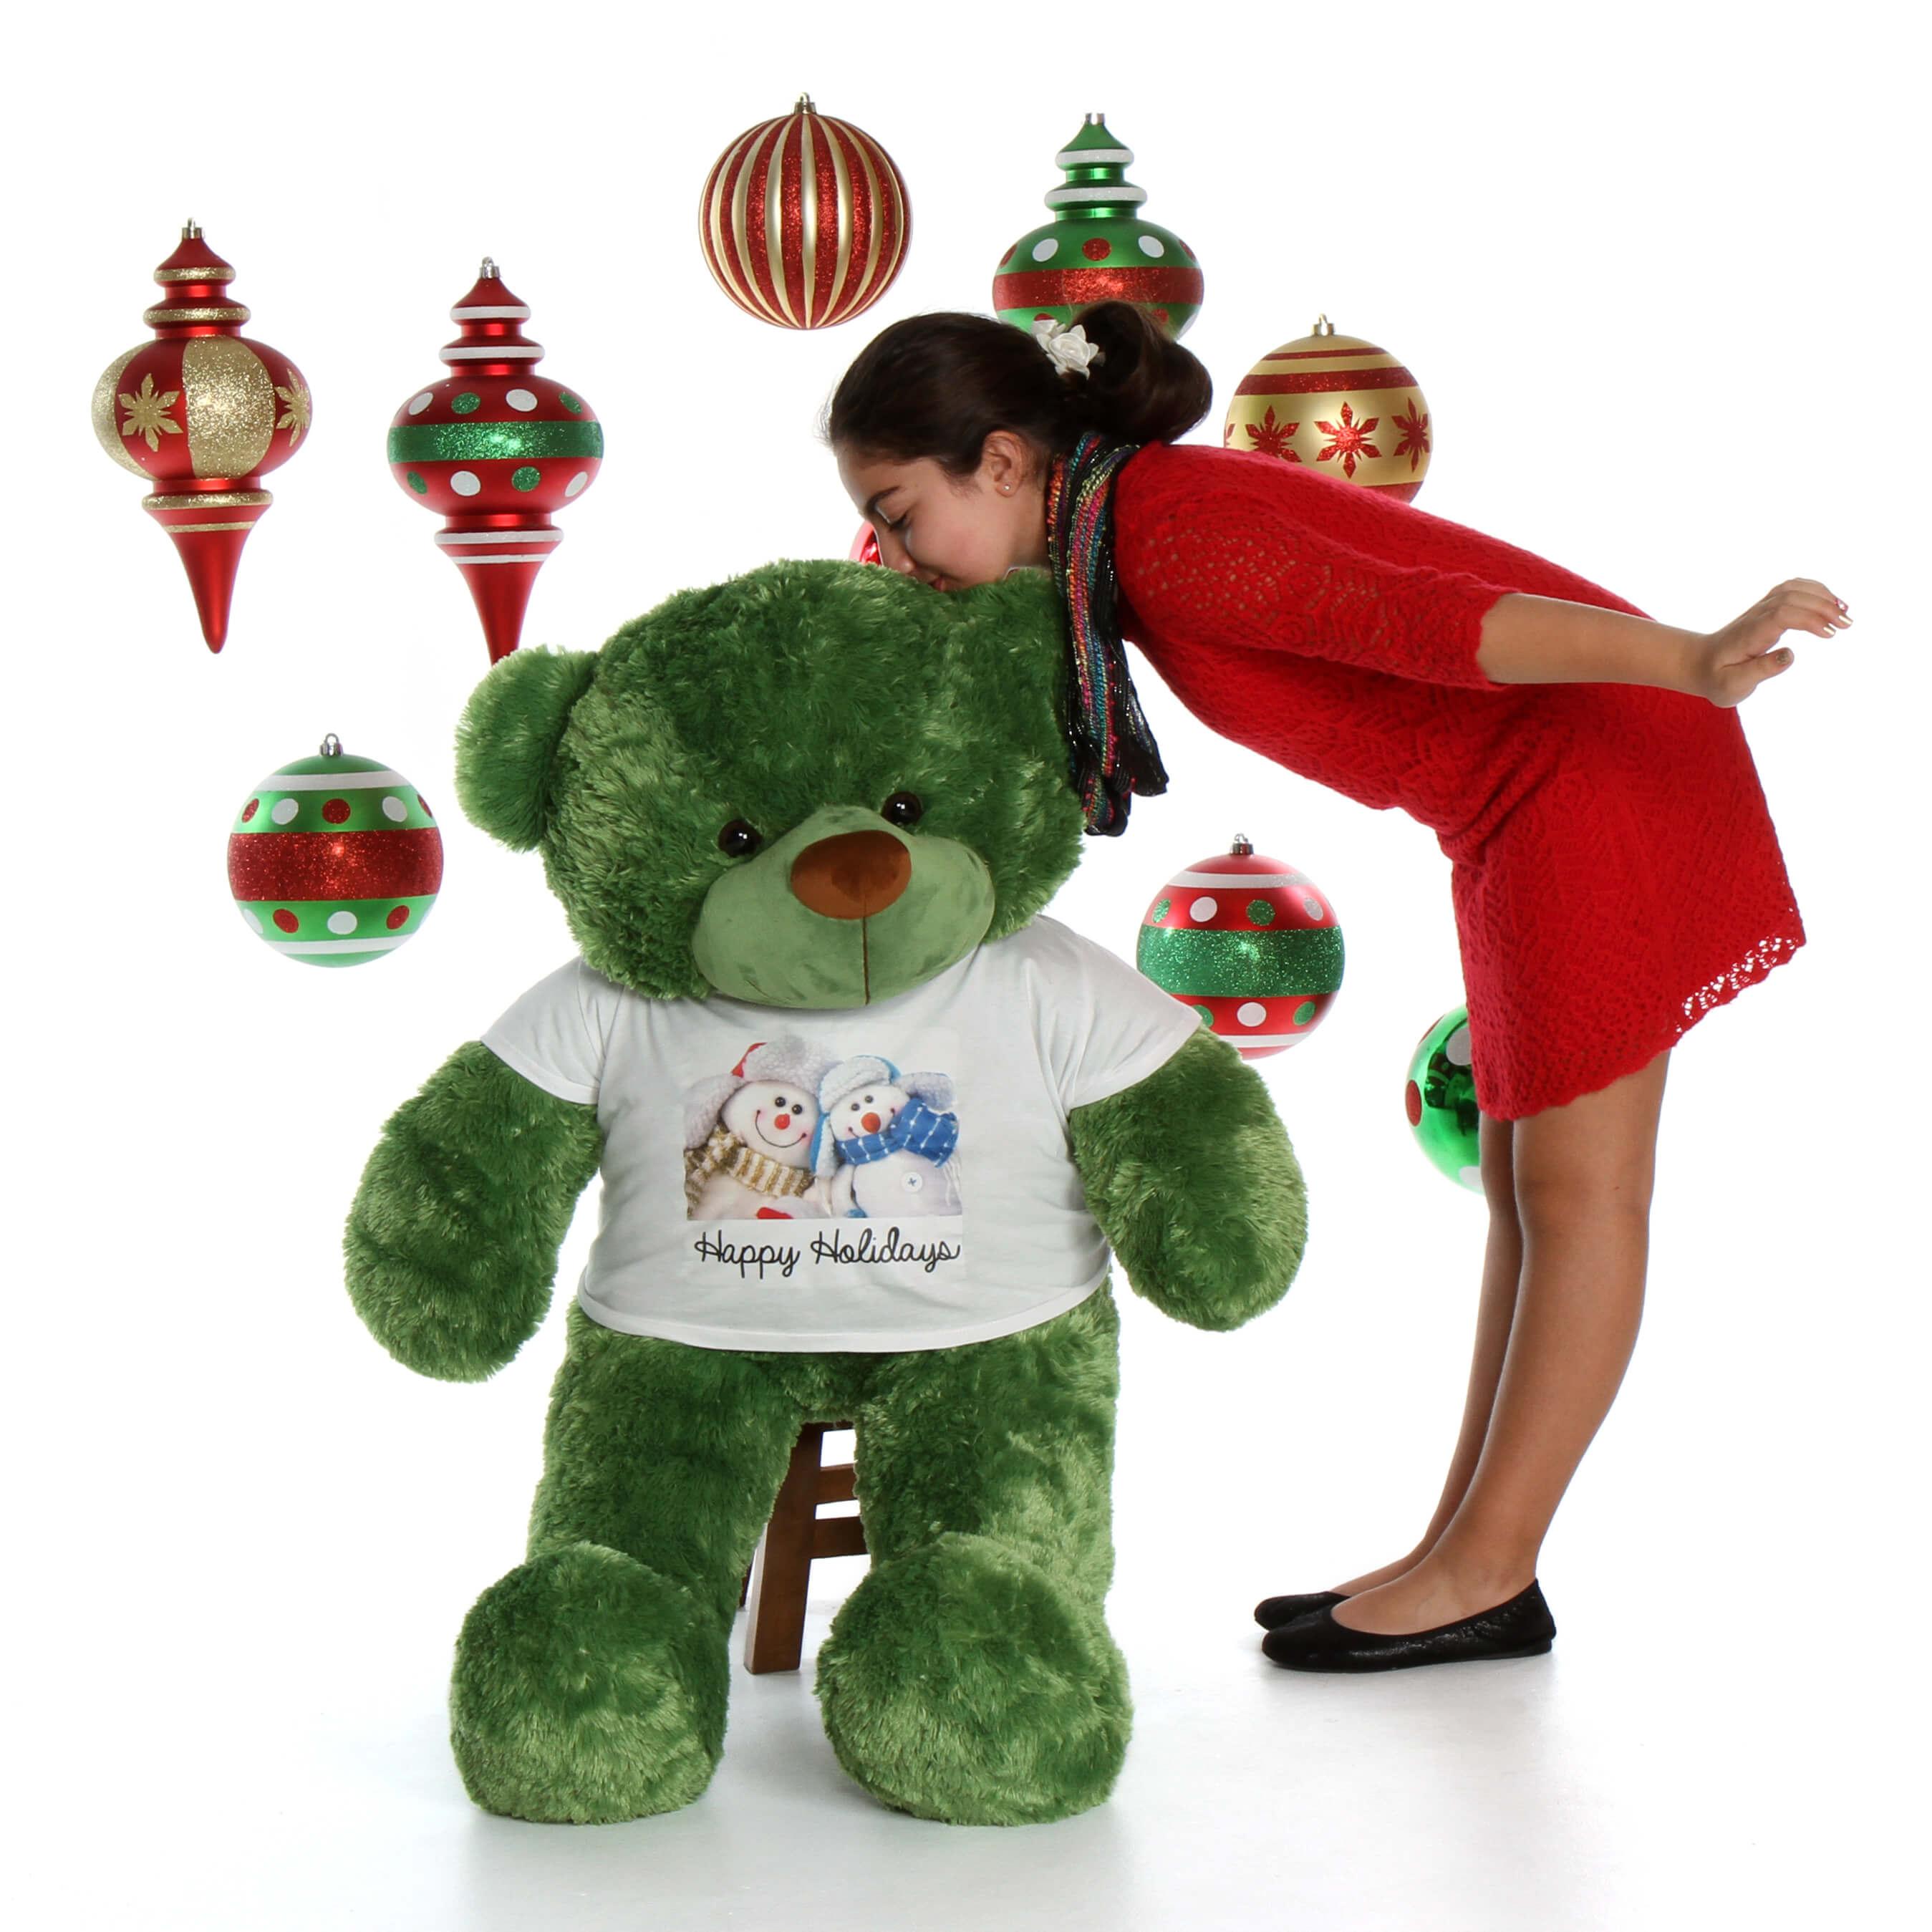 48in-lucky-cuddles-green-giant-teddy-bear-snowman-shirt-kisses1.jpg